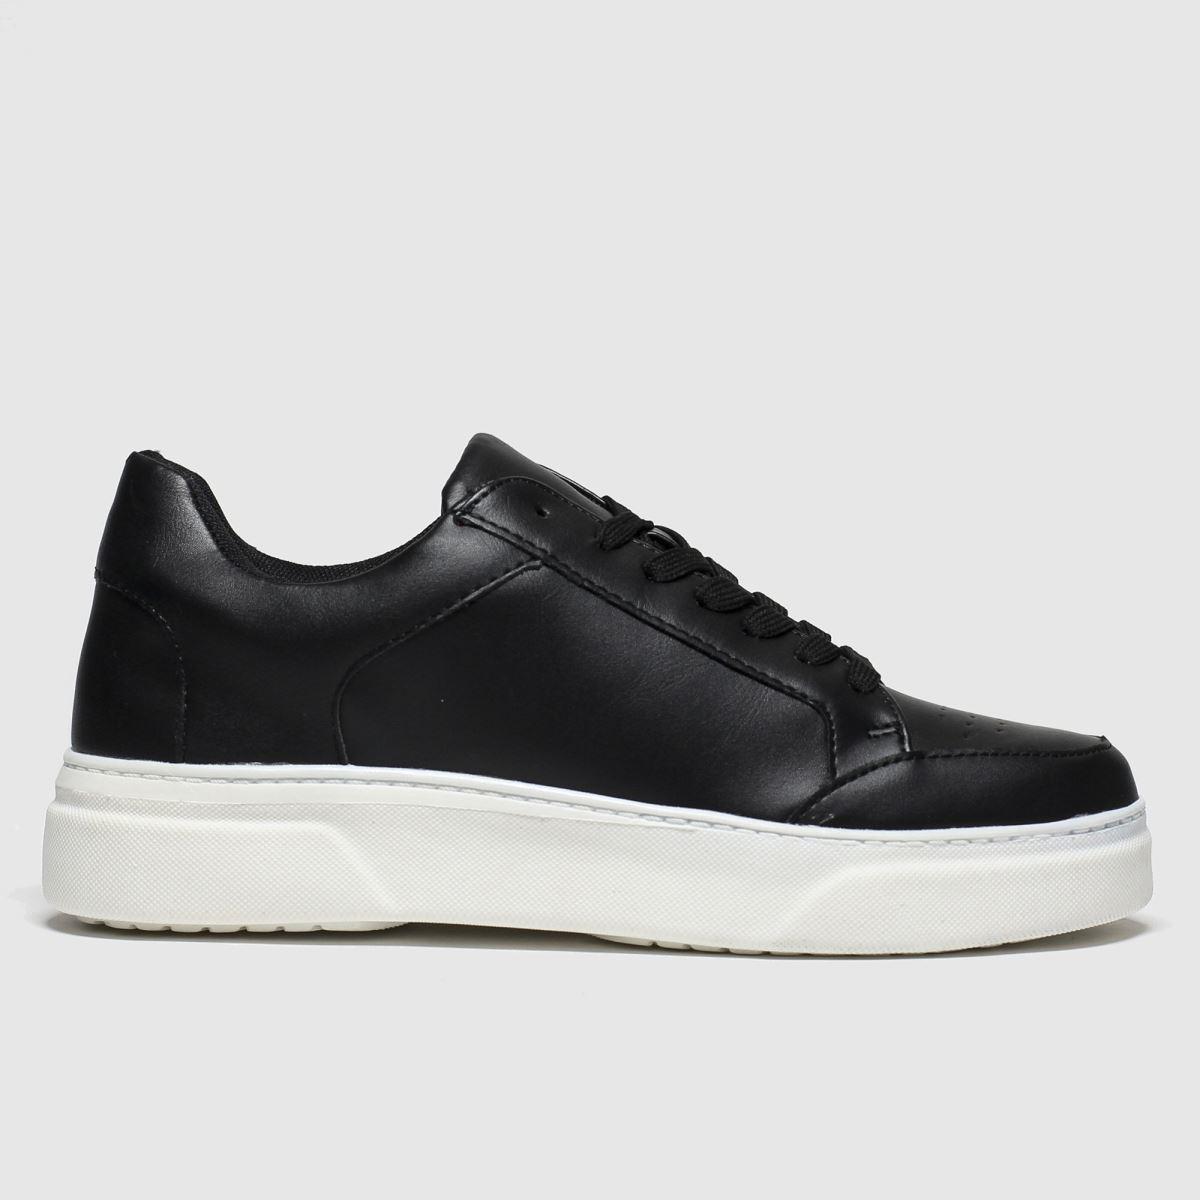 schuh Schuh Black Rewind Flat Shoes